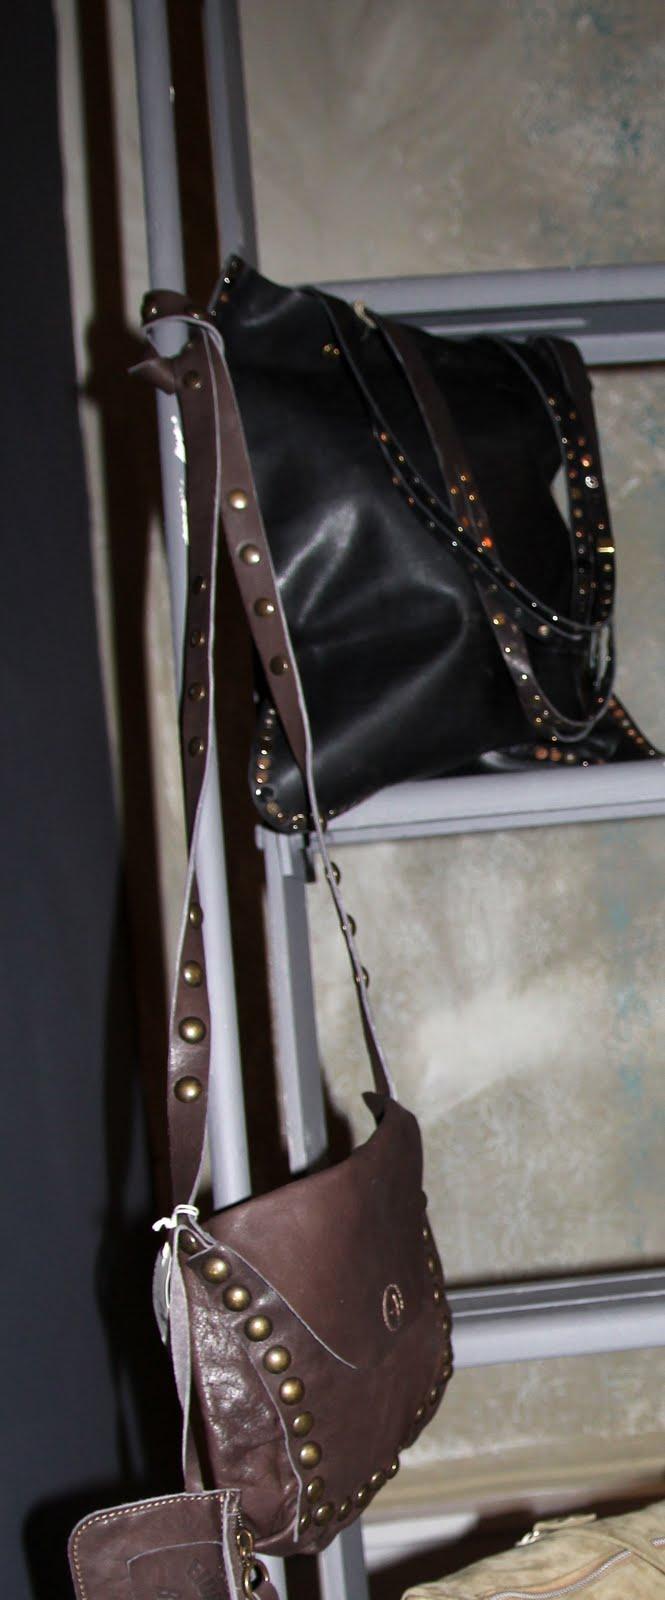 Luxe Shoes From Fiorentini Baker Coye Nokes Dana Davis Espro Madison Shoulder Handbag Navy Prices Range 500 800